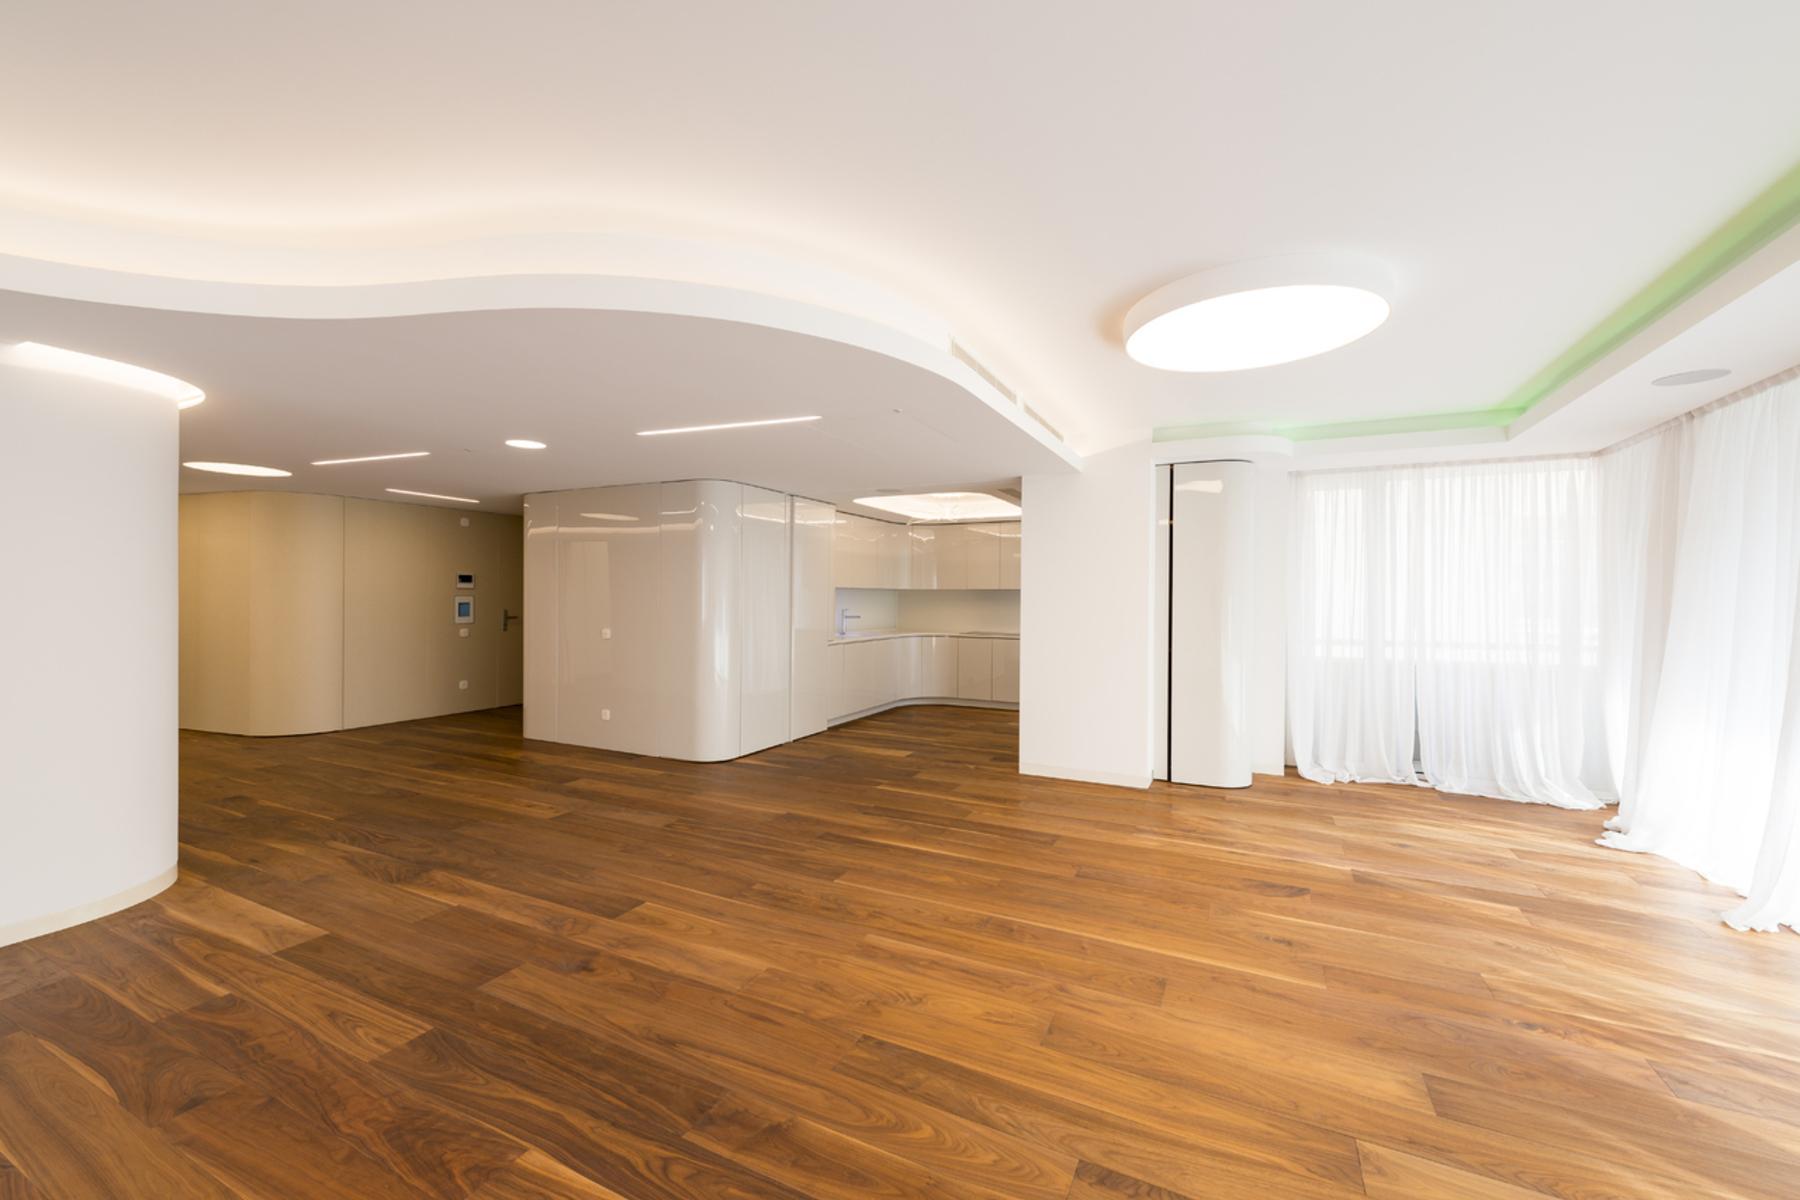 Apartment for Sale at Modern apartment in the center Lugano, Lugano, Ticino, 6900 Switzerland